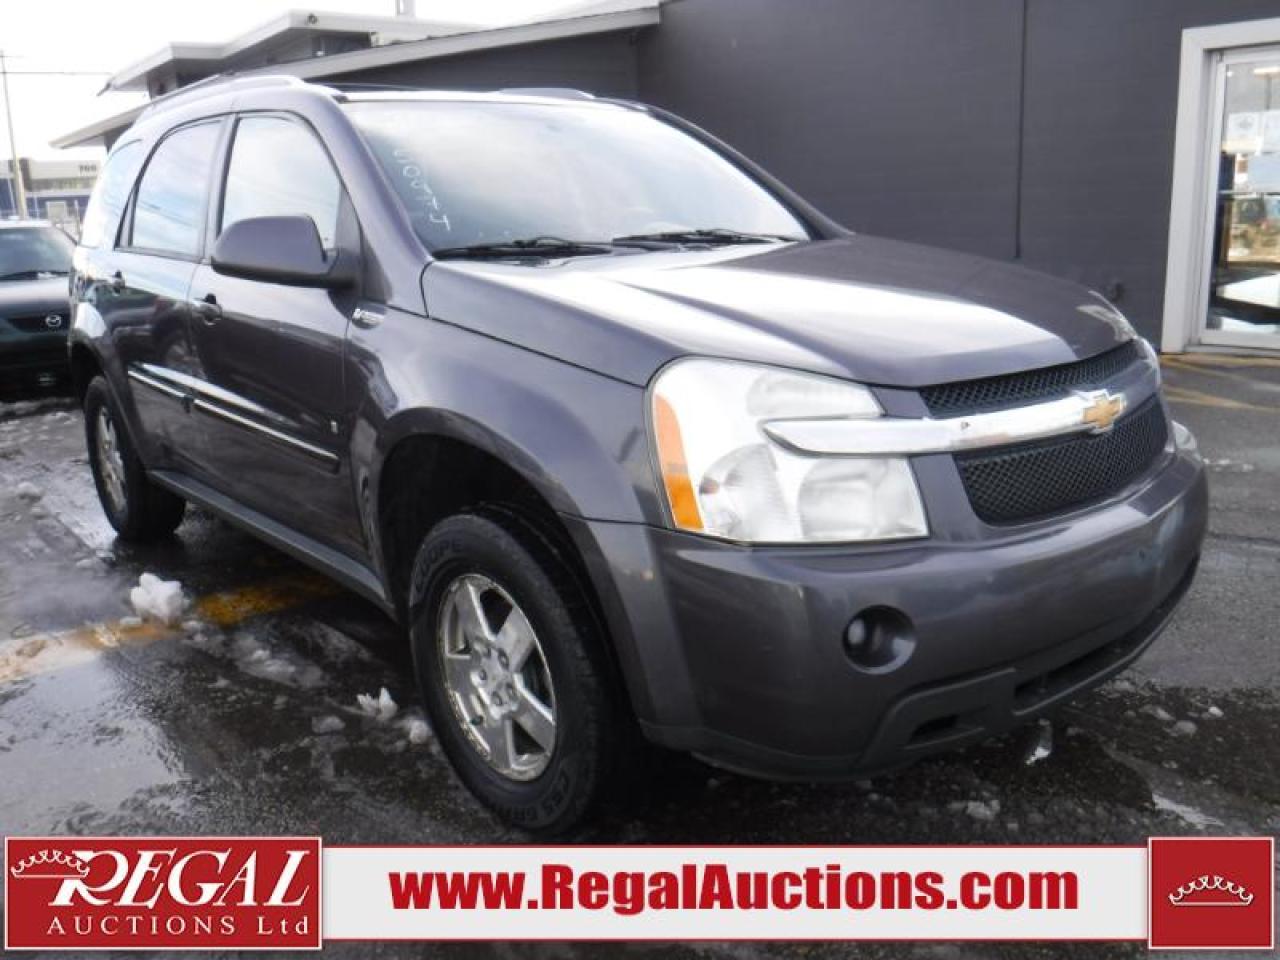 Photo of Grey 2007 Chevrolet Equinox